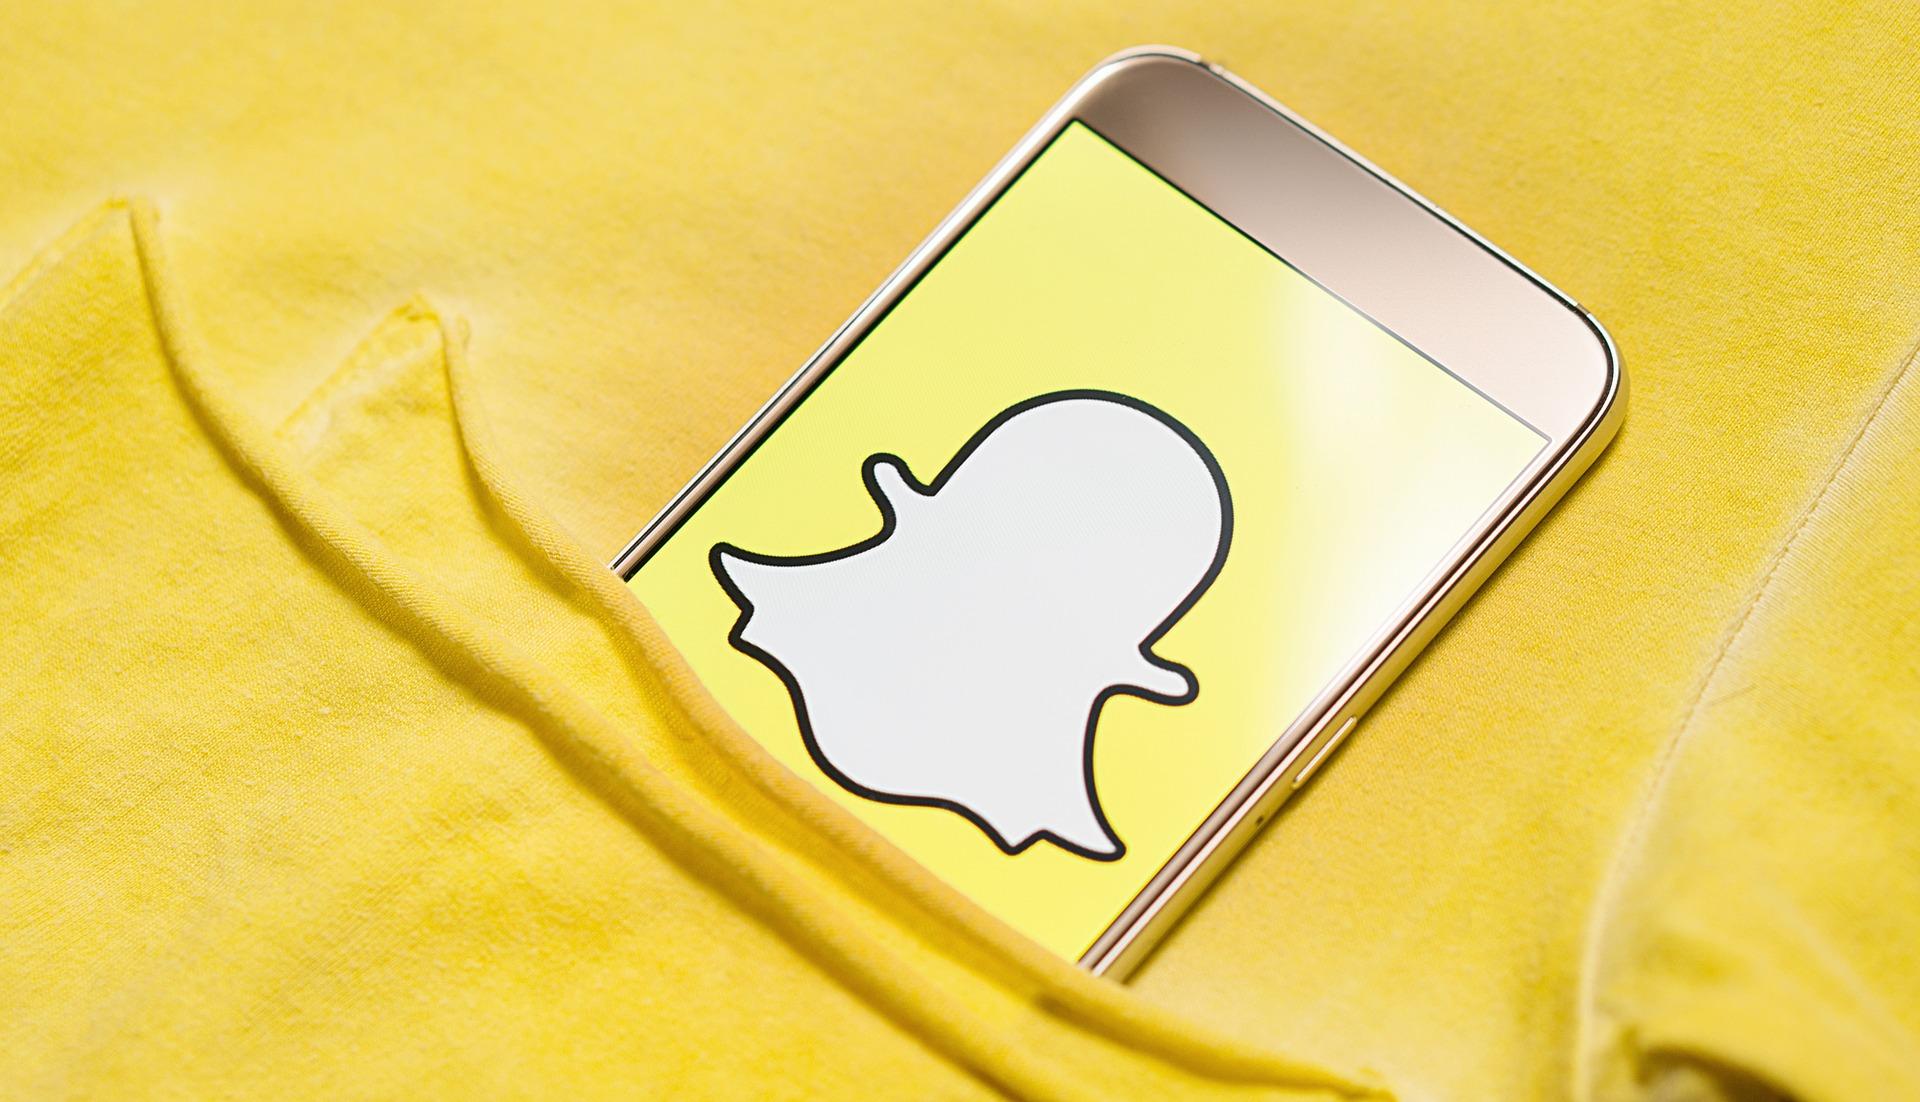 Phone with Snapchat logo